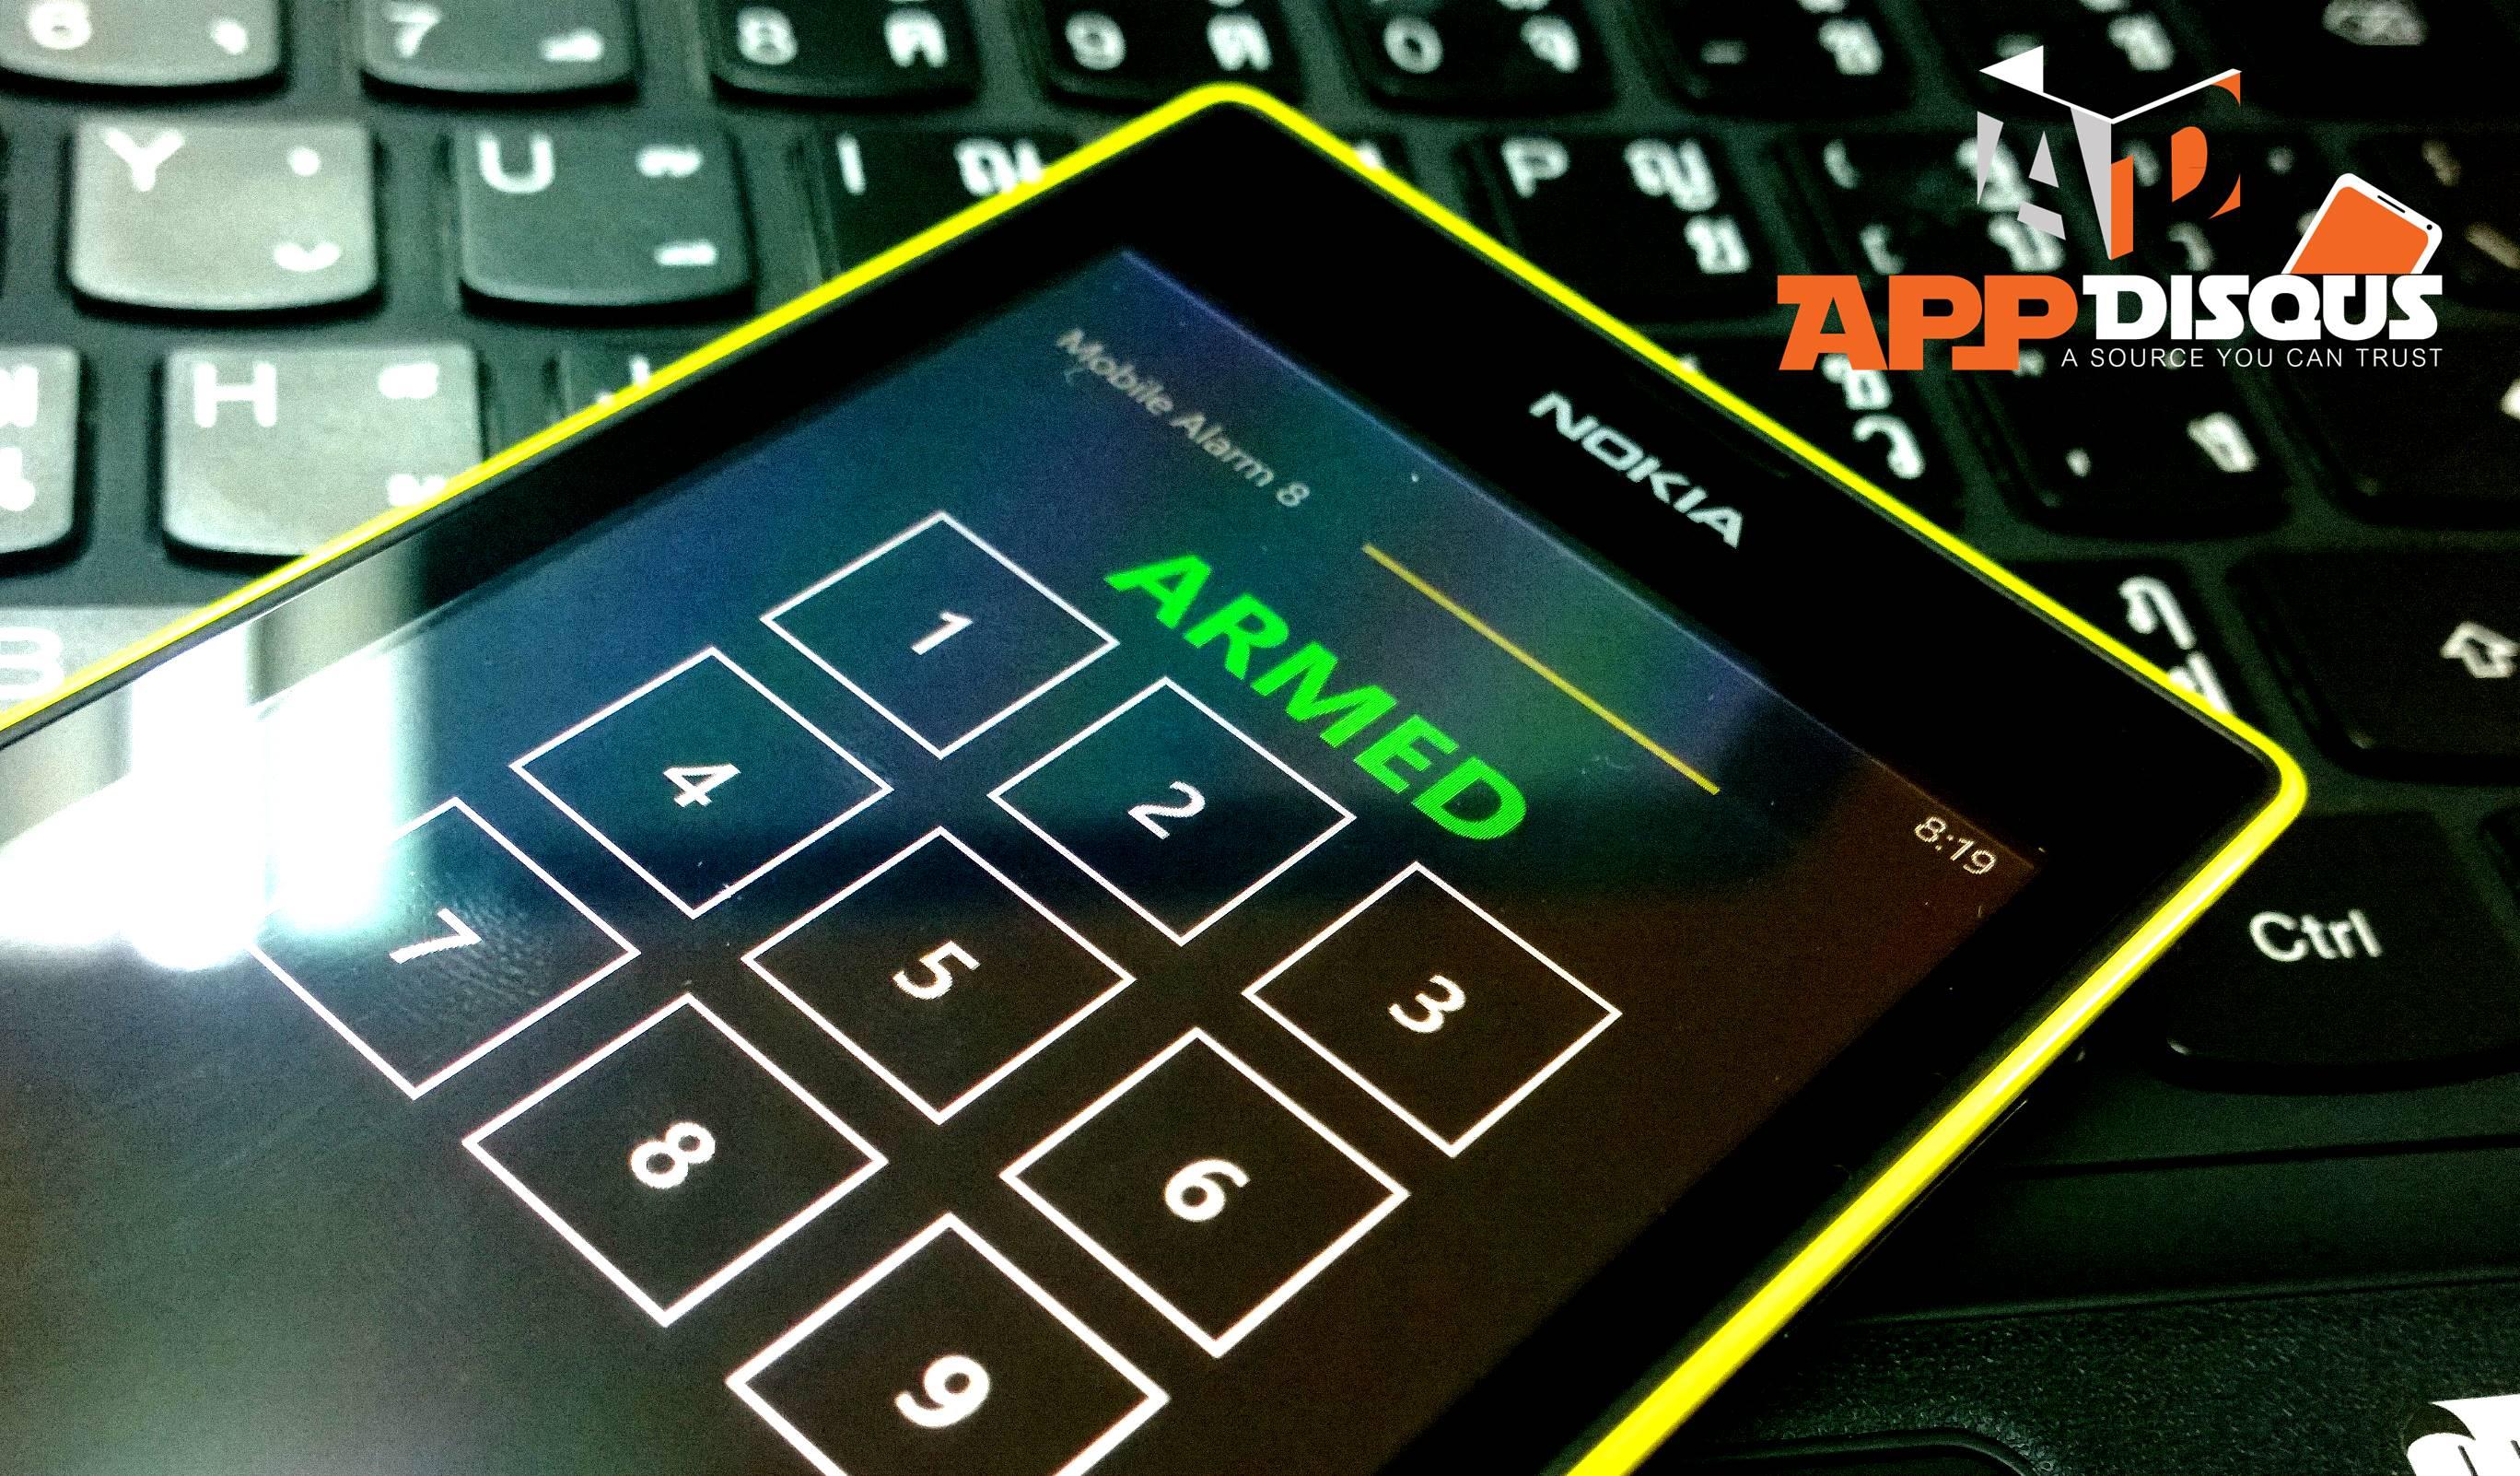 Mobile Security Alarm 8 windows phone on nokia lumia